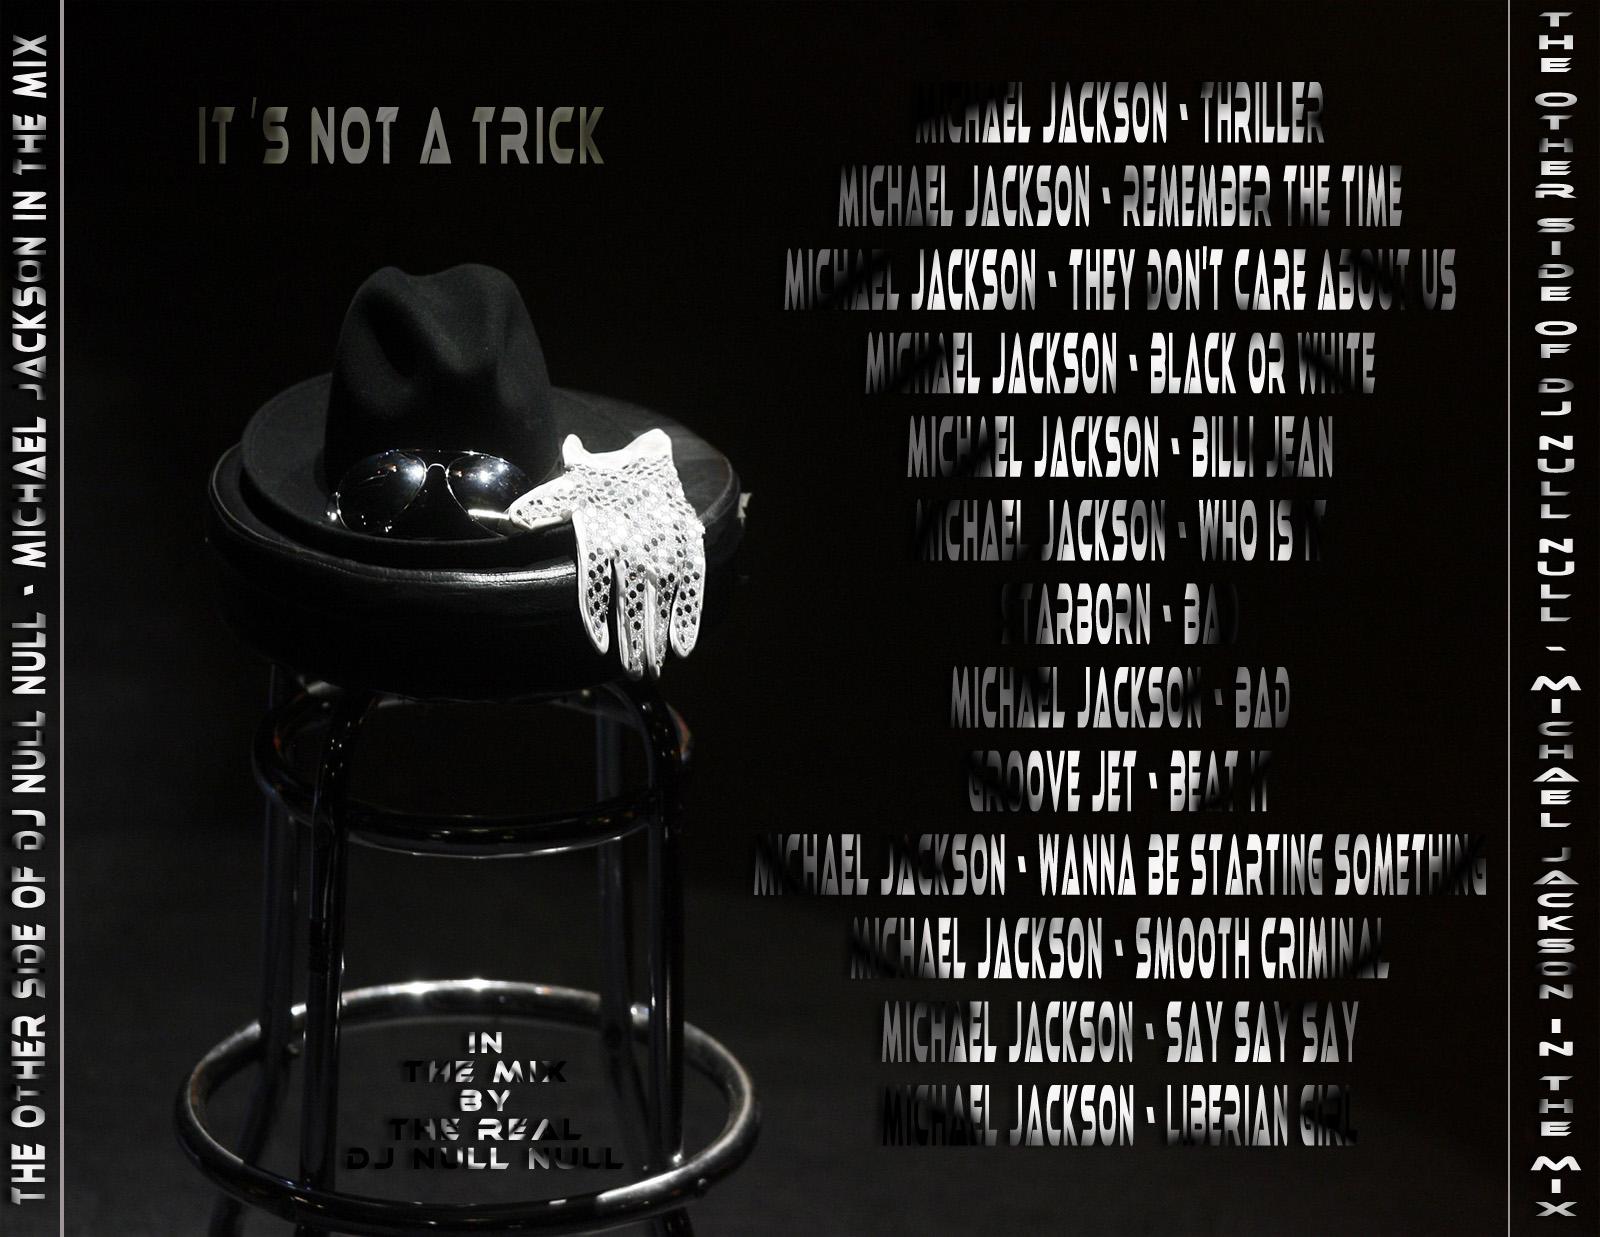 Michael Jackson - Mega Mix (Dj Null Null 2010)